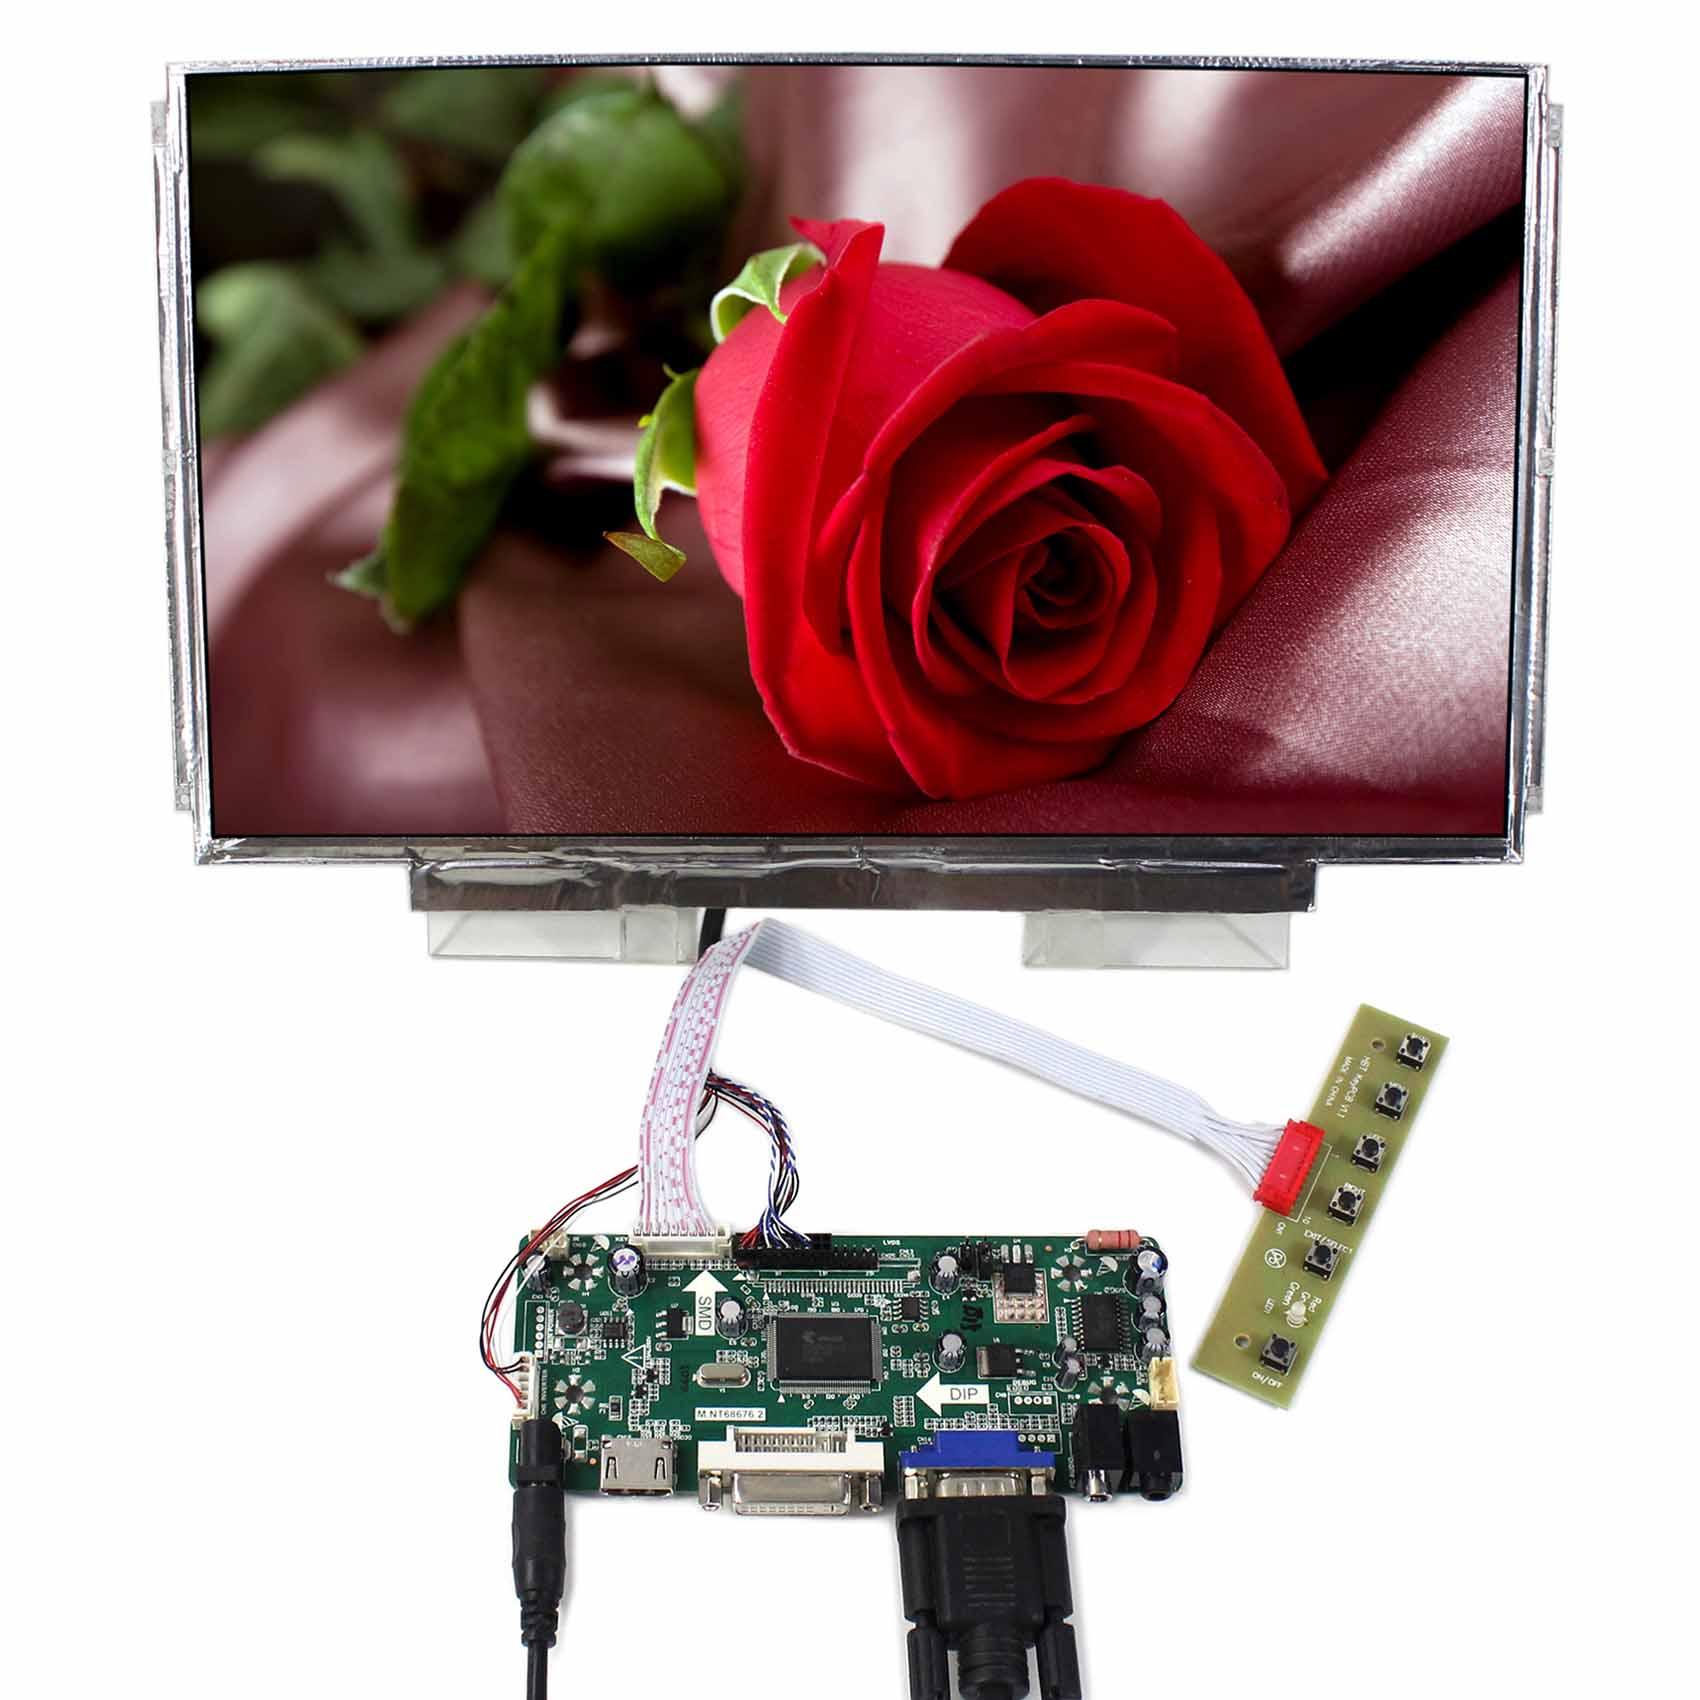 LCD Controller Board LCD Driver HDMI DVI VGA LCD Board 13.3 LCD Screen N133BGE 1366x768 ResolutionLCD Controller Board LCD Driver HDMI DVI VGA LCD Board 13.3 LCD Screen N133BGE 1366x768 Resolution